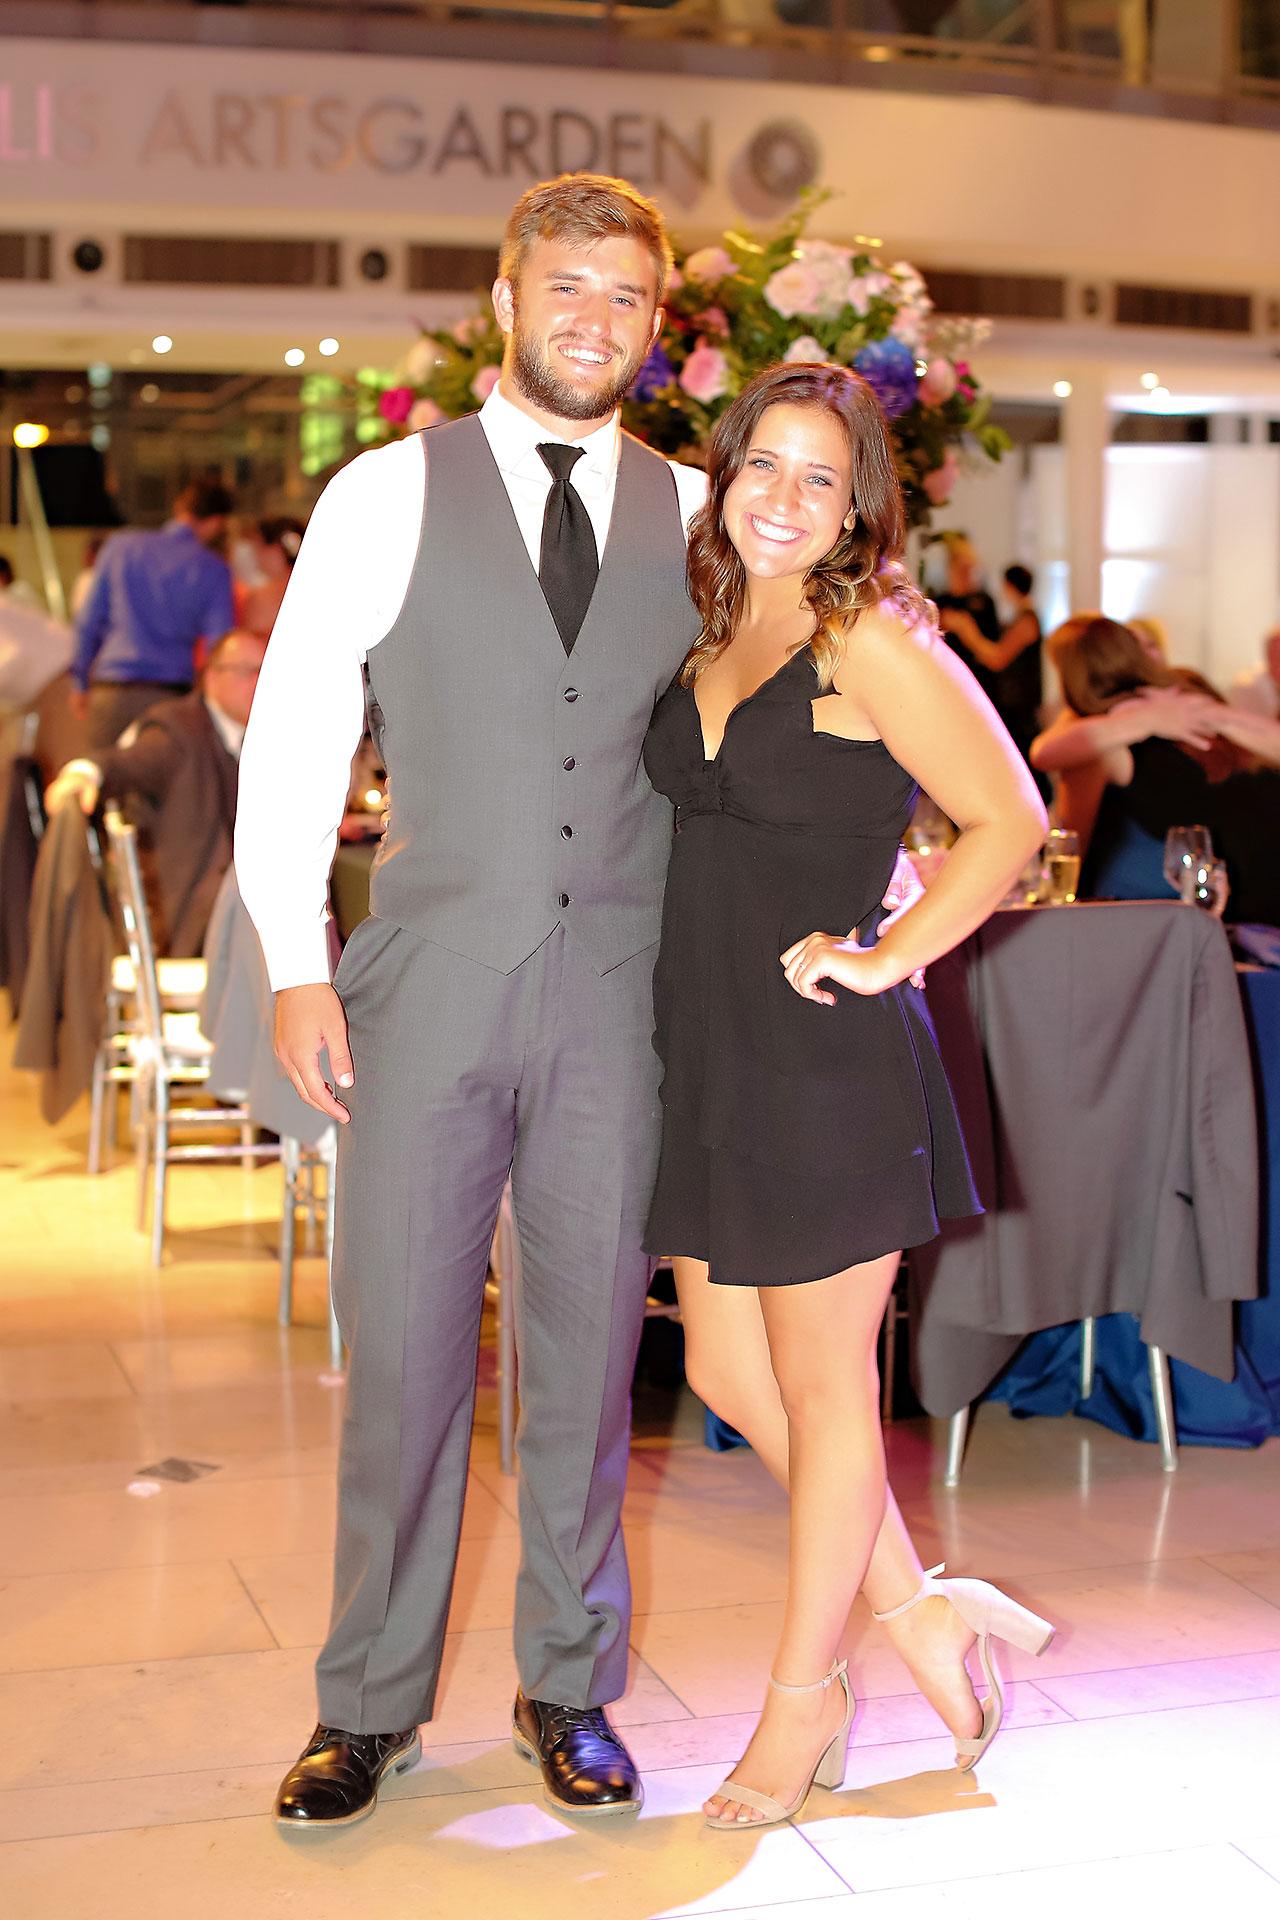 Erin John Artsgarden Indianapolis Wedding 350